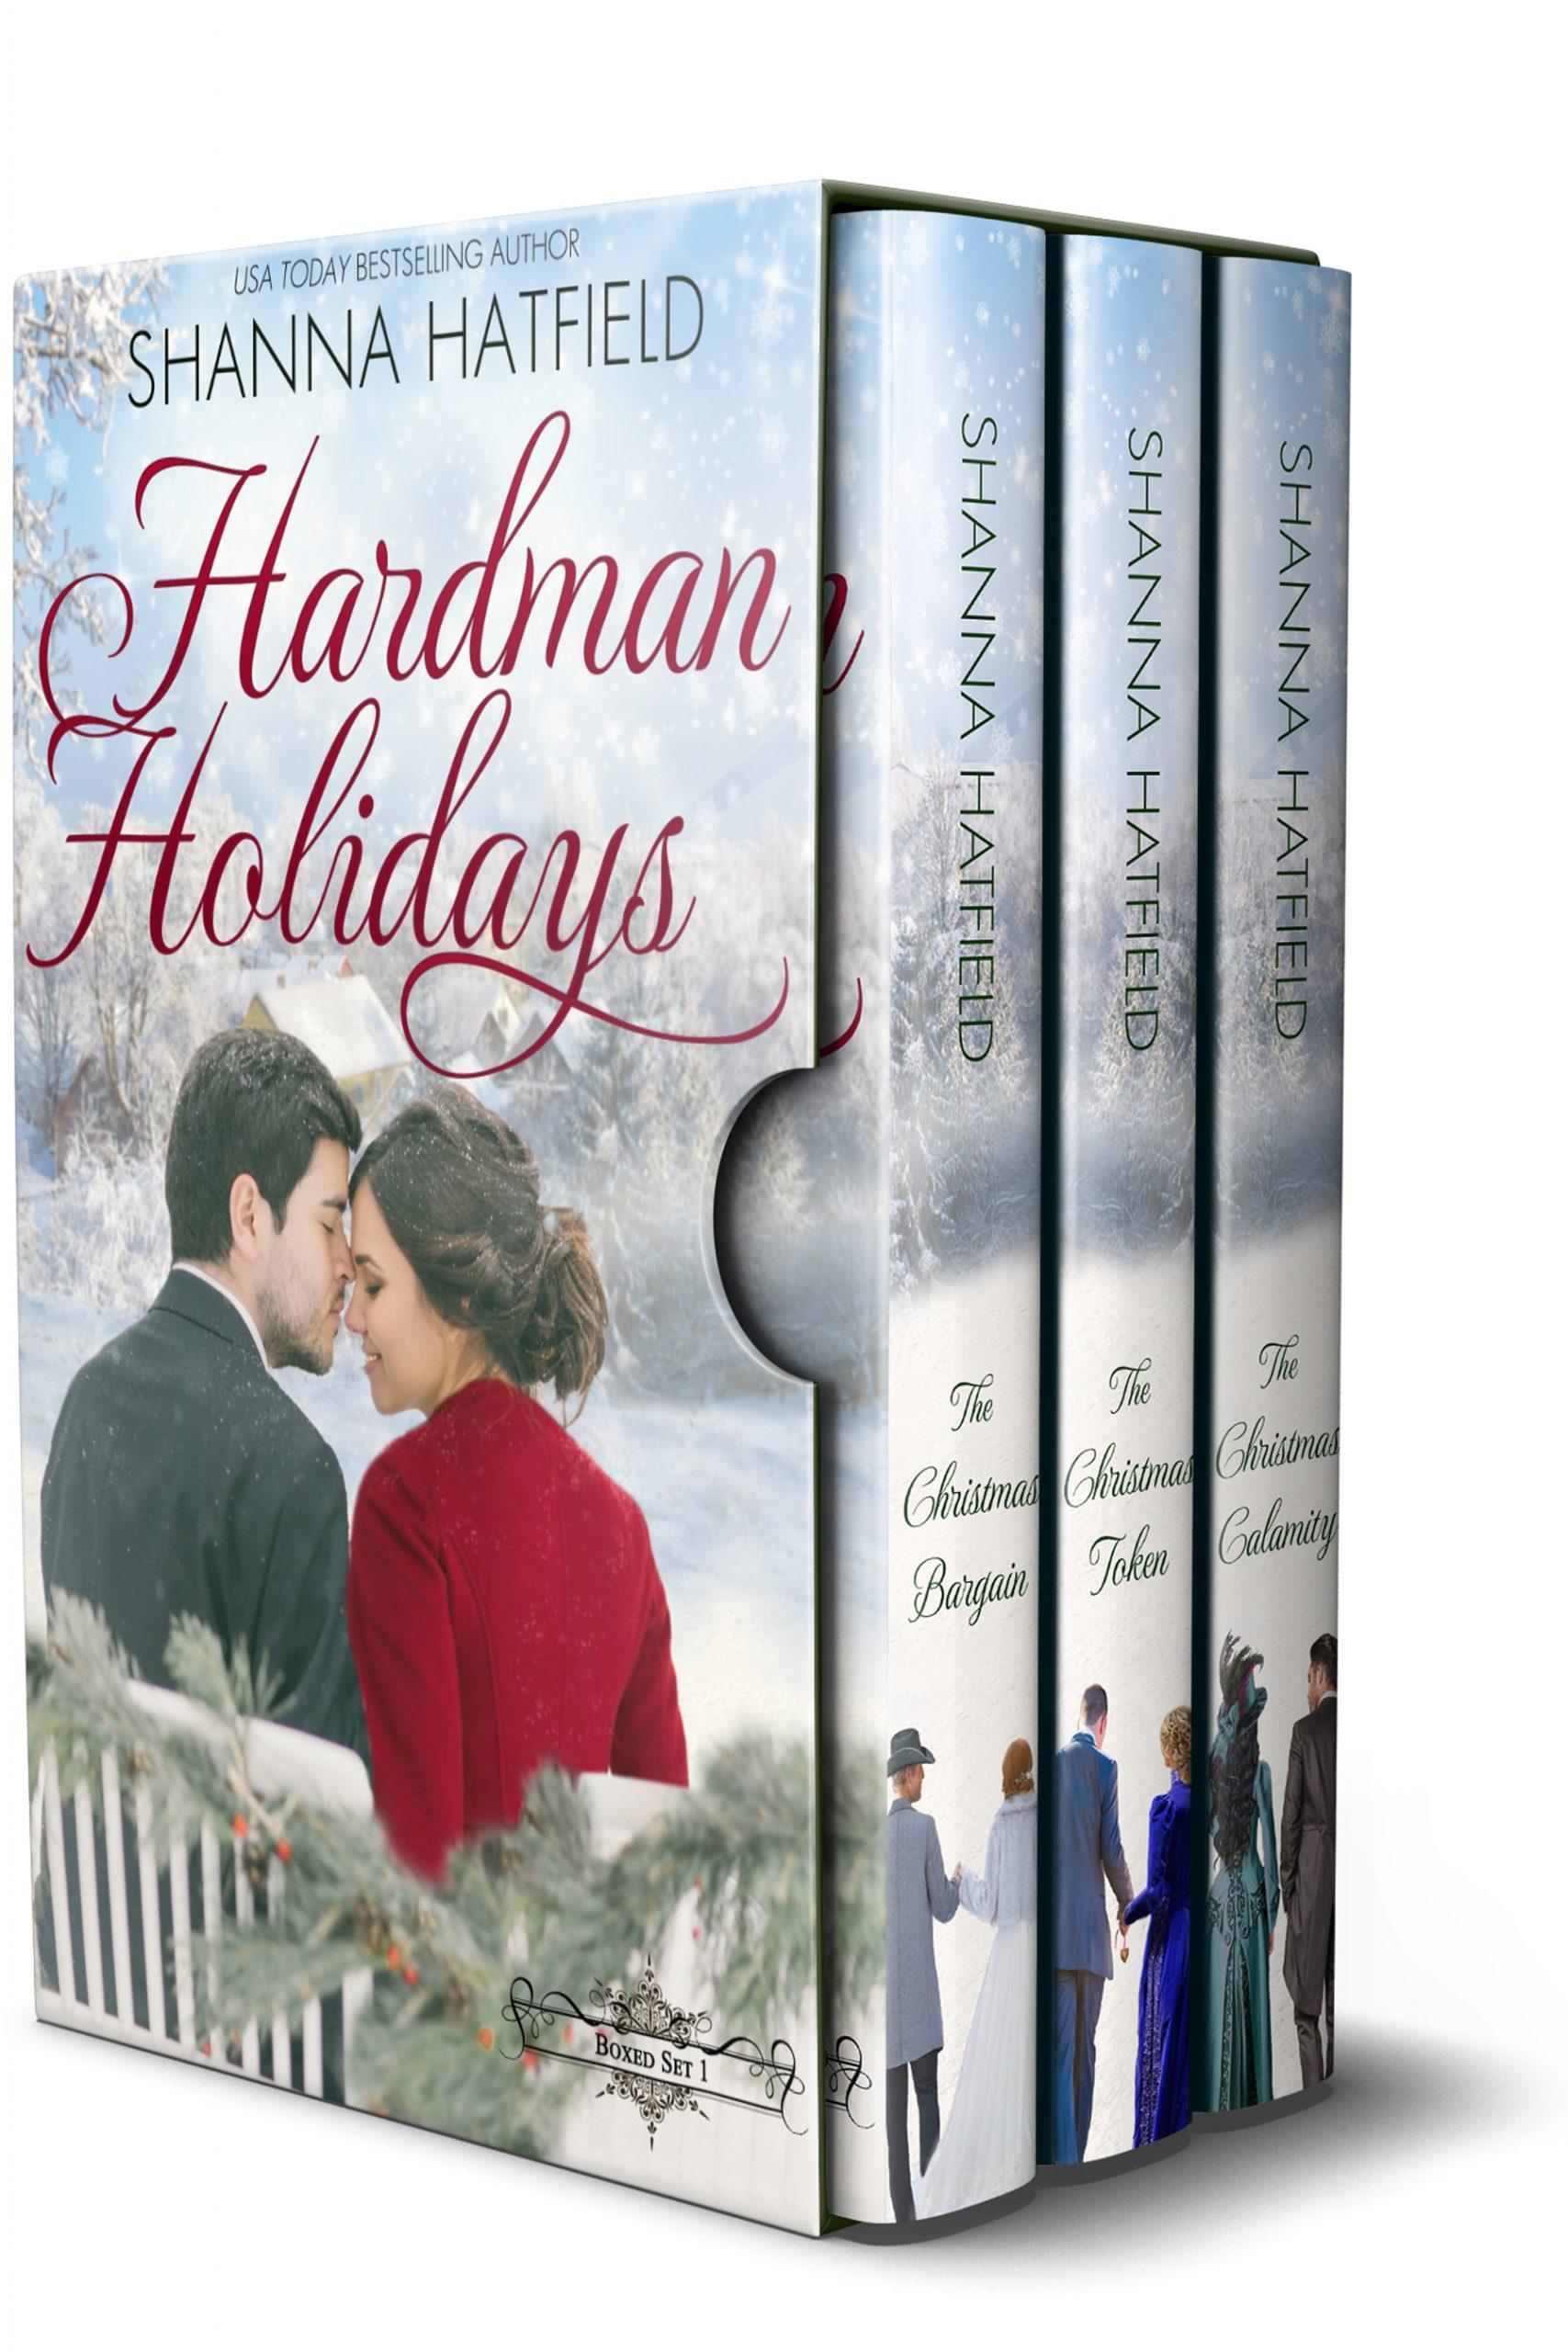 Hardman Holidays 3d Boxed set cover